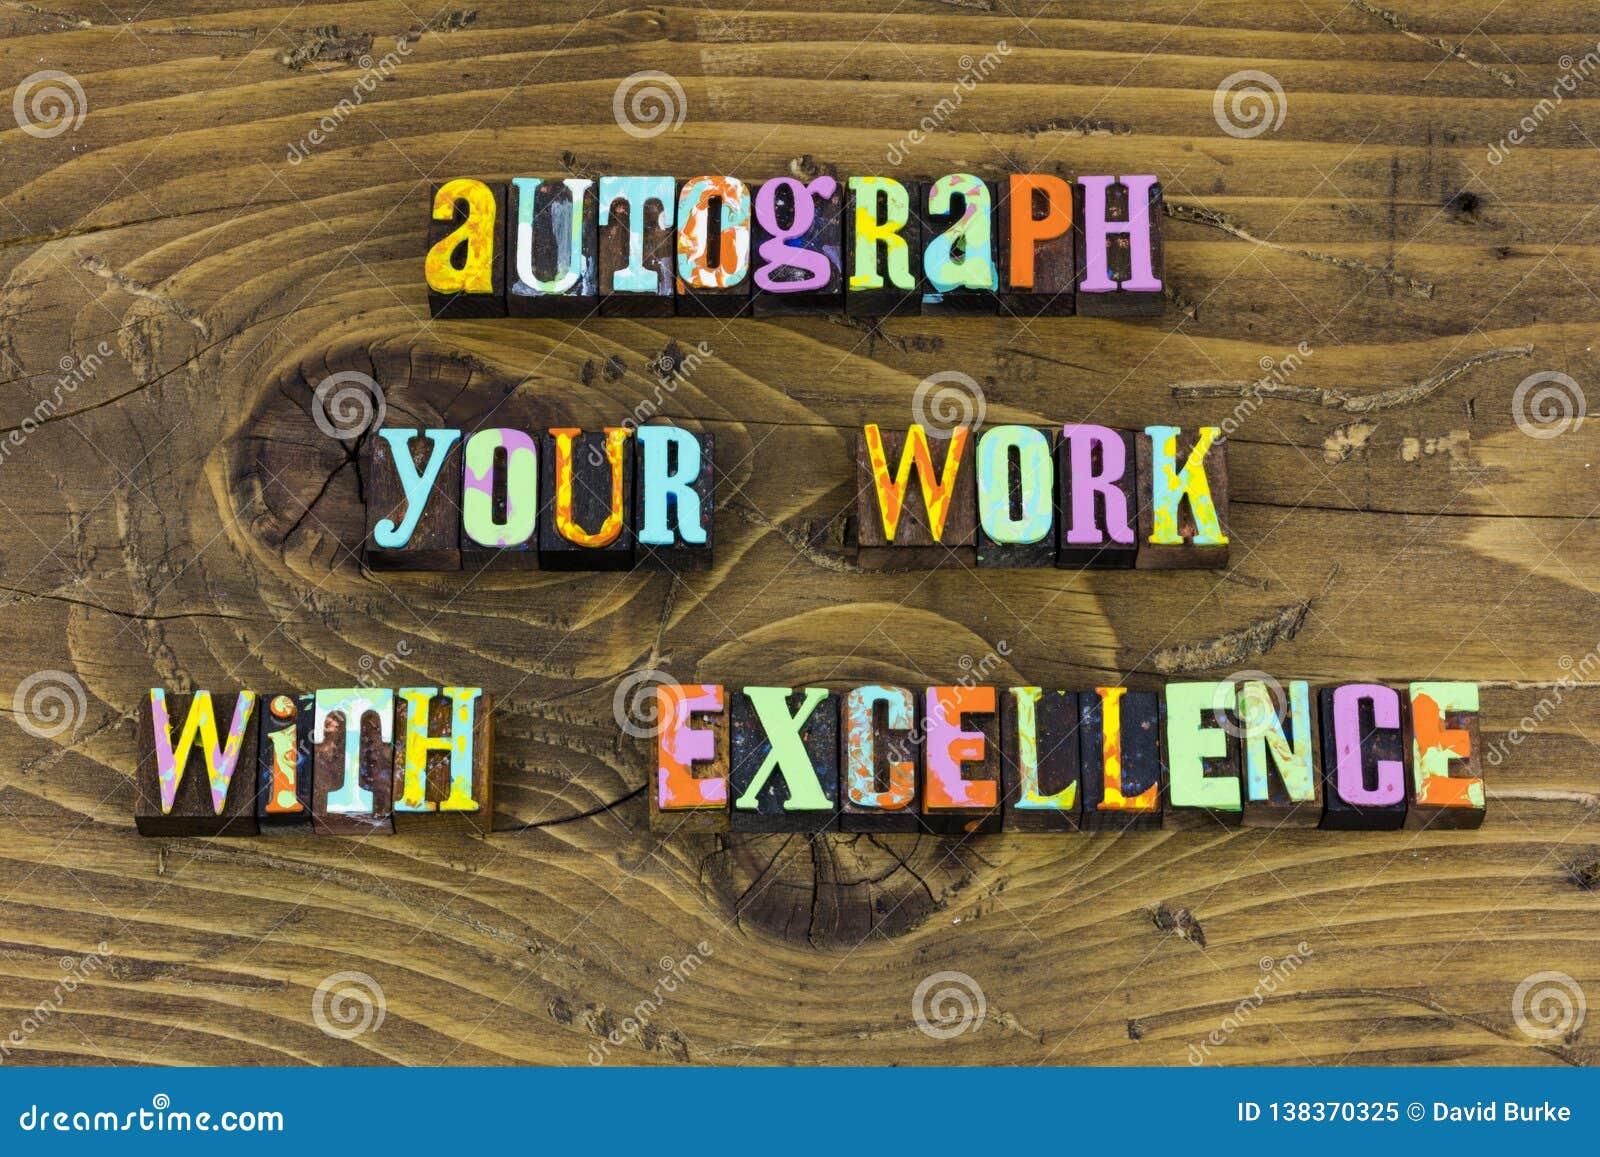 Autograph work pride leadership success letterpress